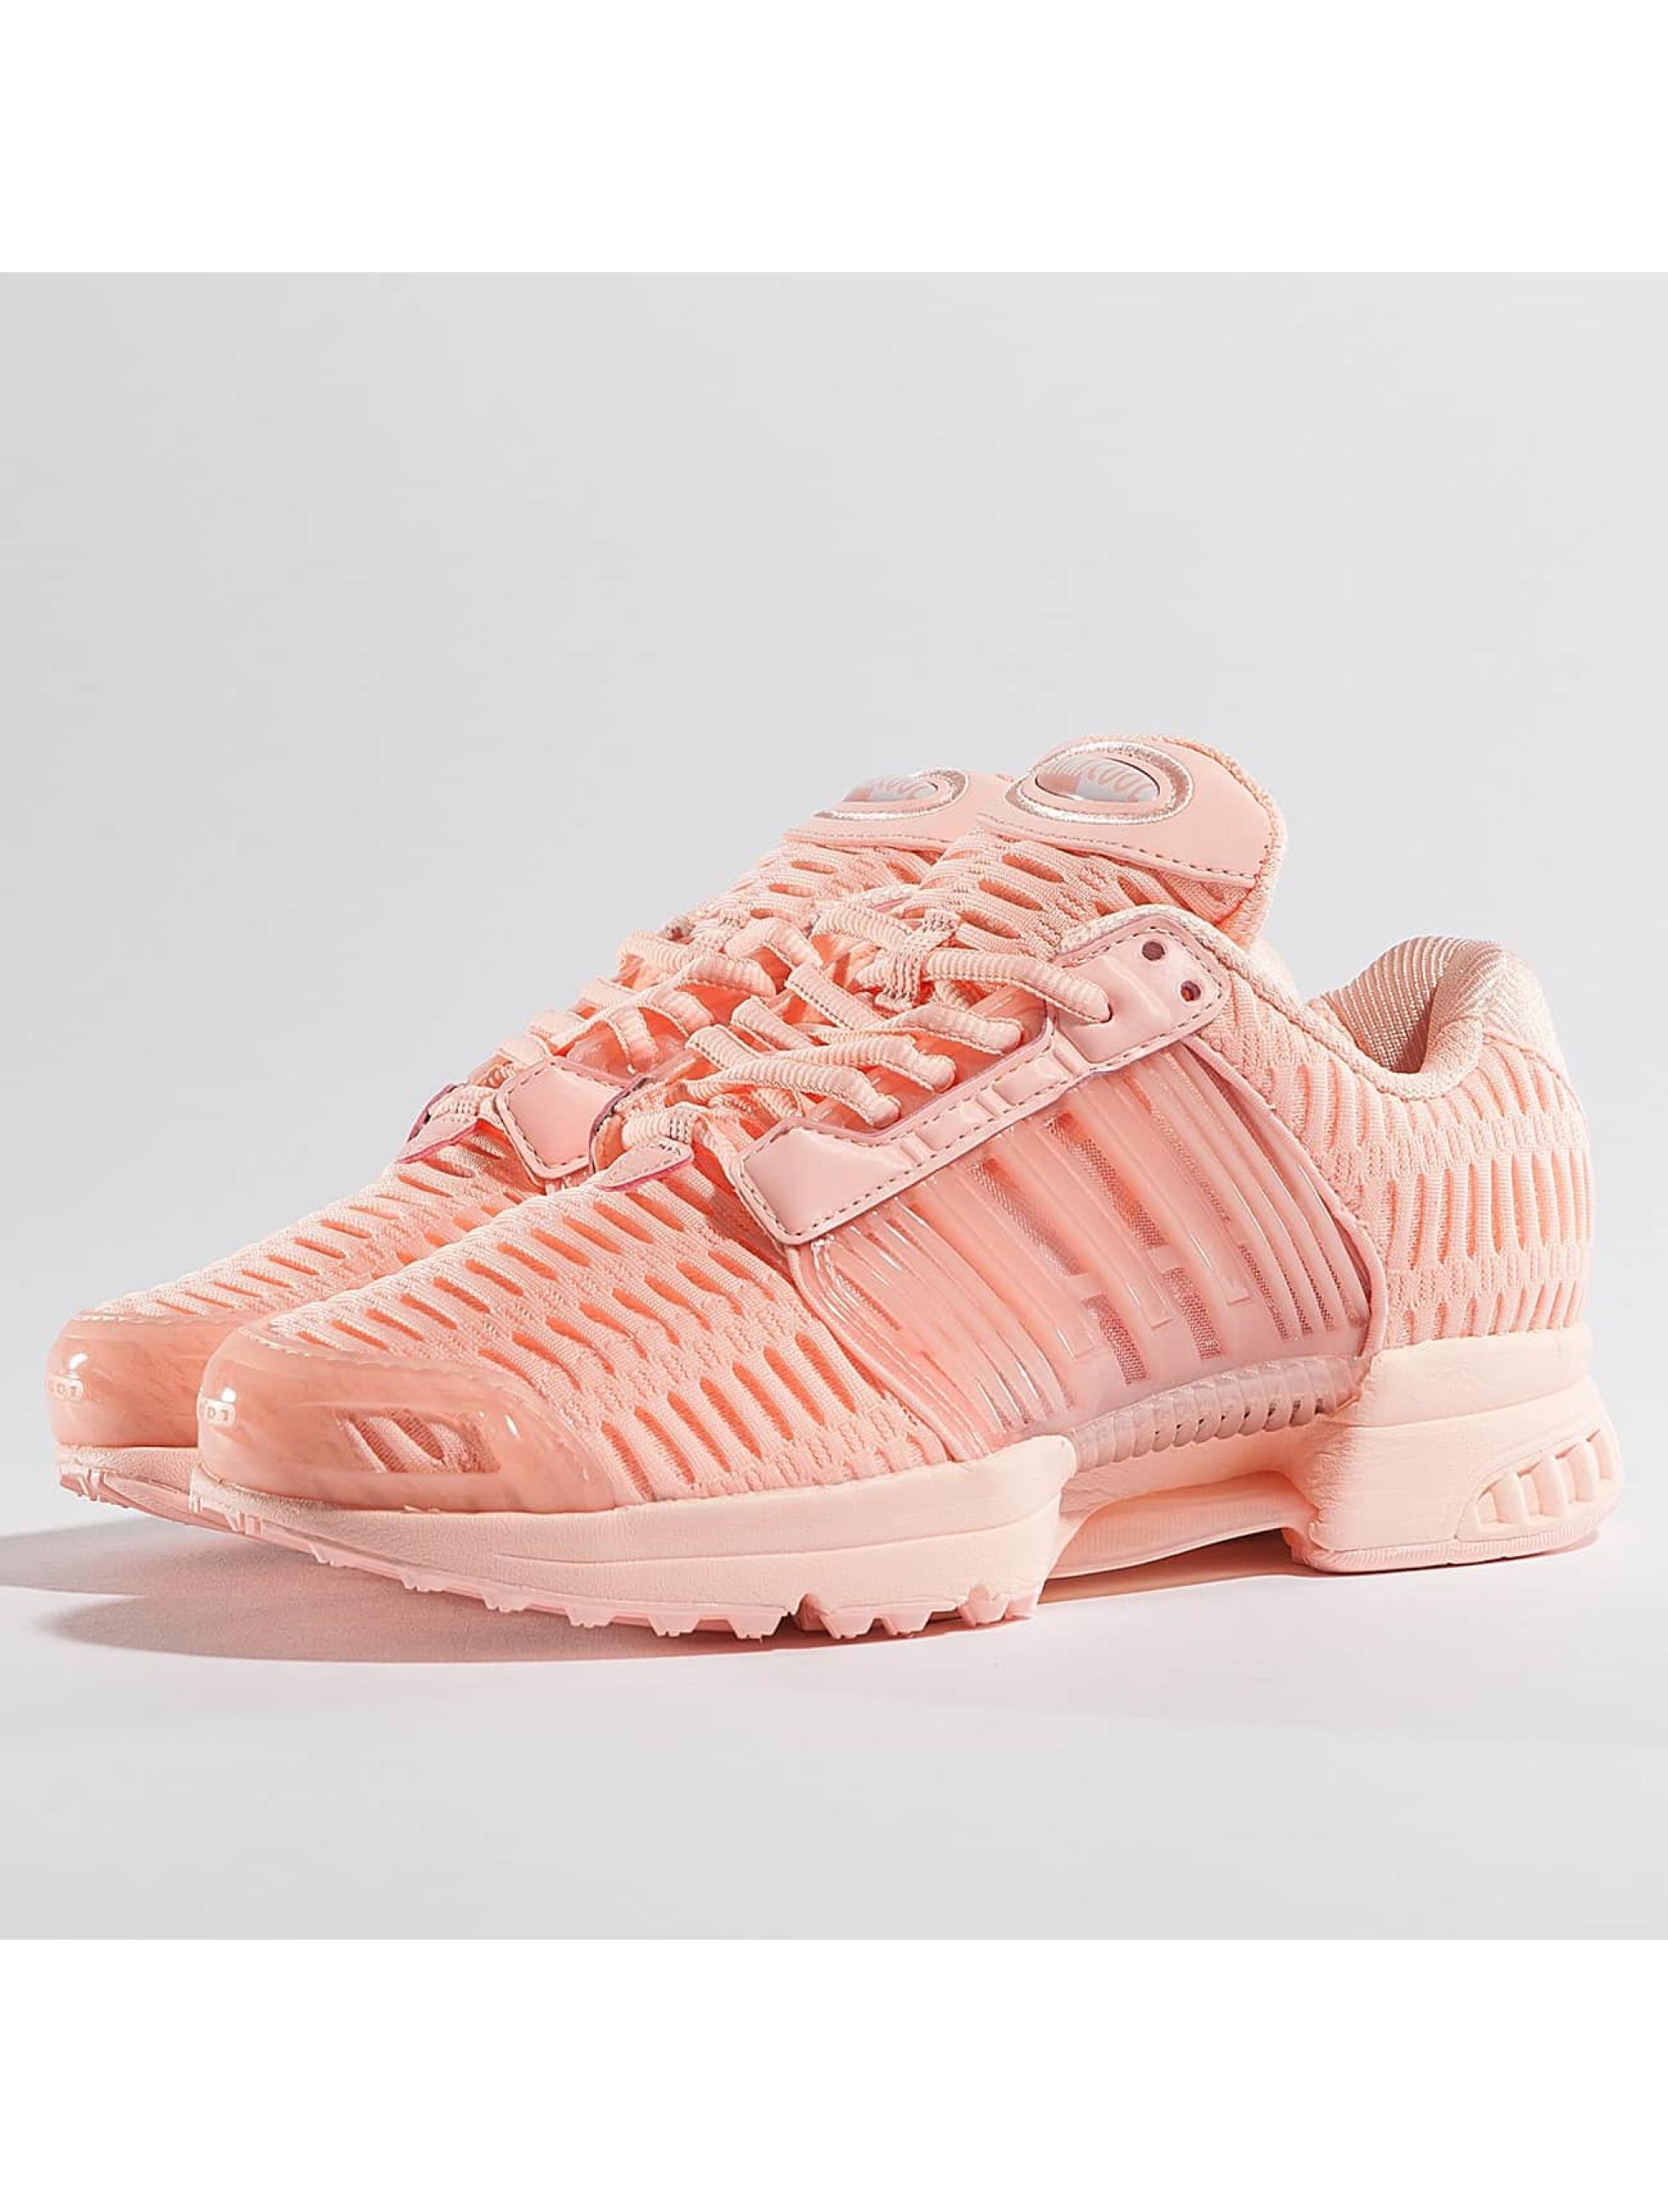 adidas Frauen Sneaker Climacool in orange